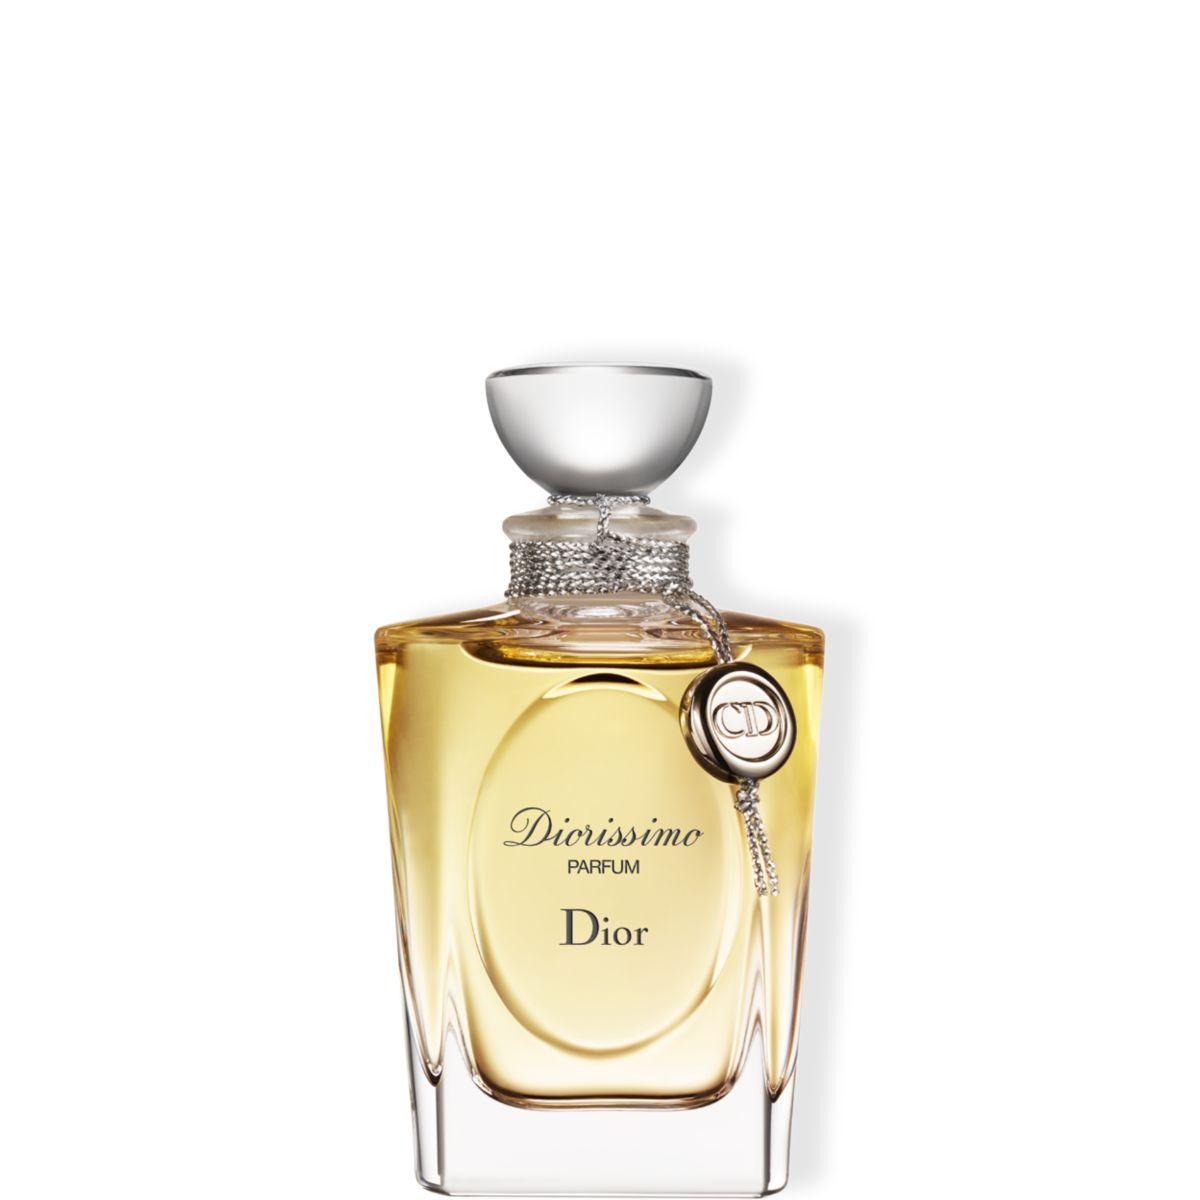 Dior - Diorissimo - Extrait de Parfum Flacon 15 ml